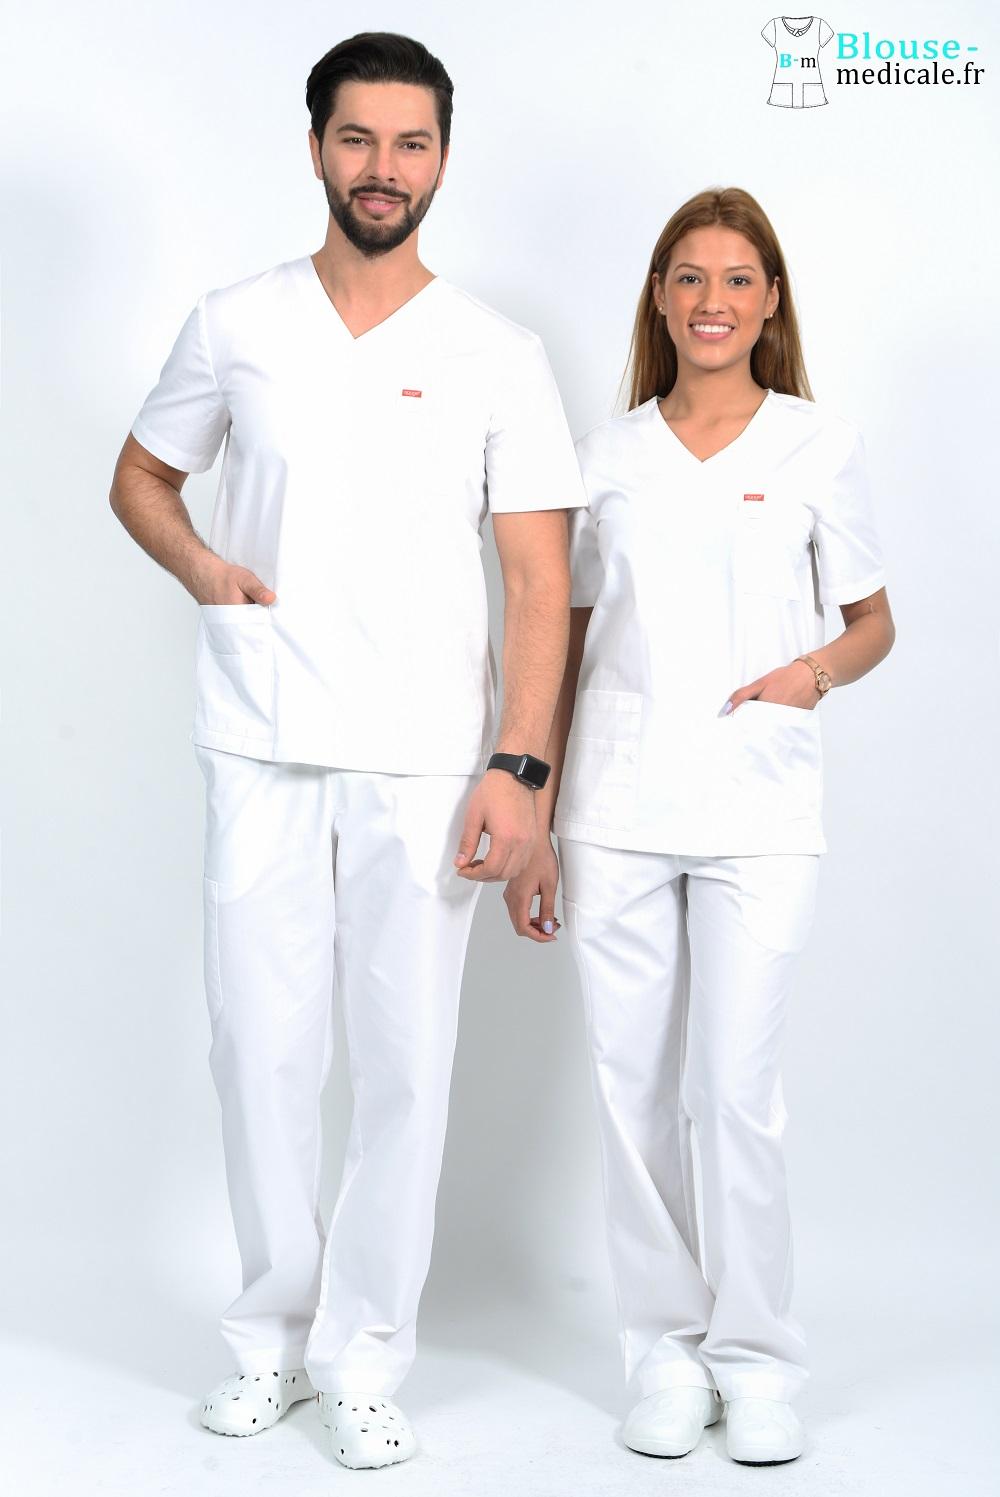 tenue medicale unisexe tenue equipe médicale tenue unisexe couleur